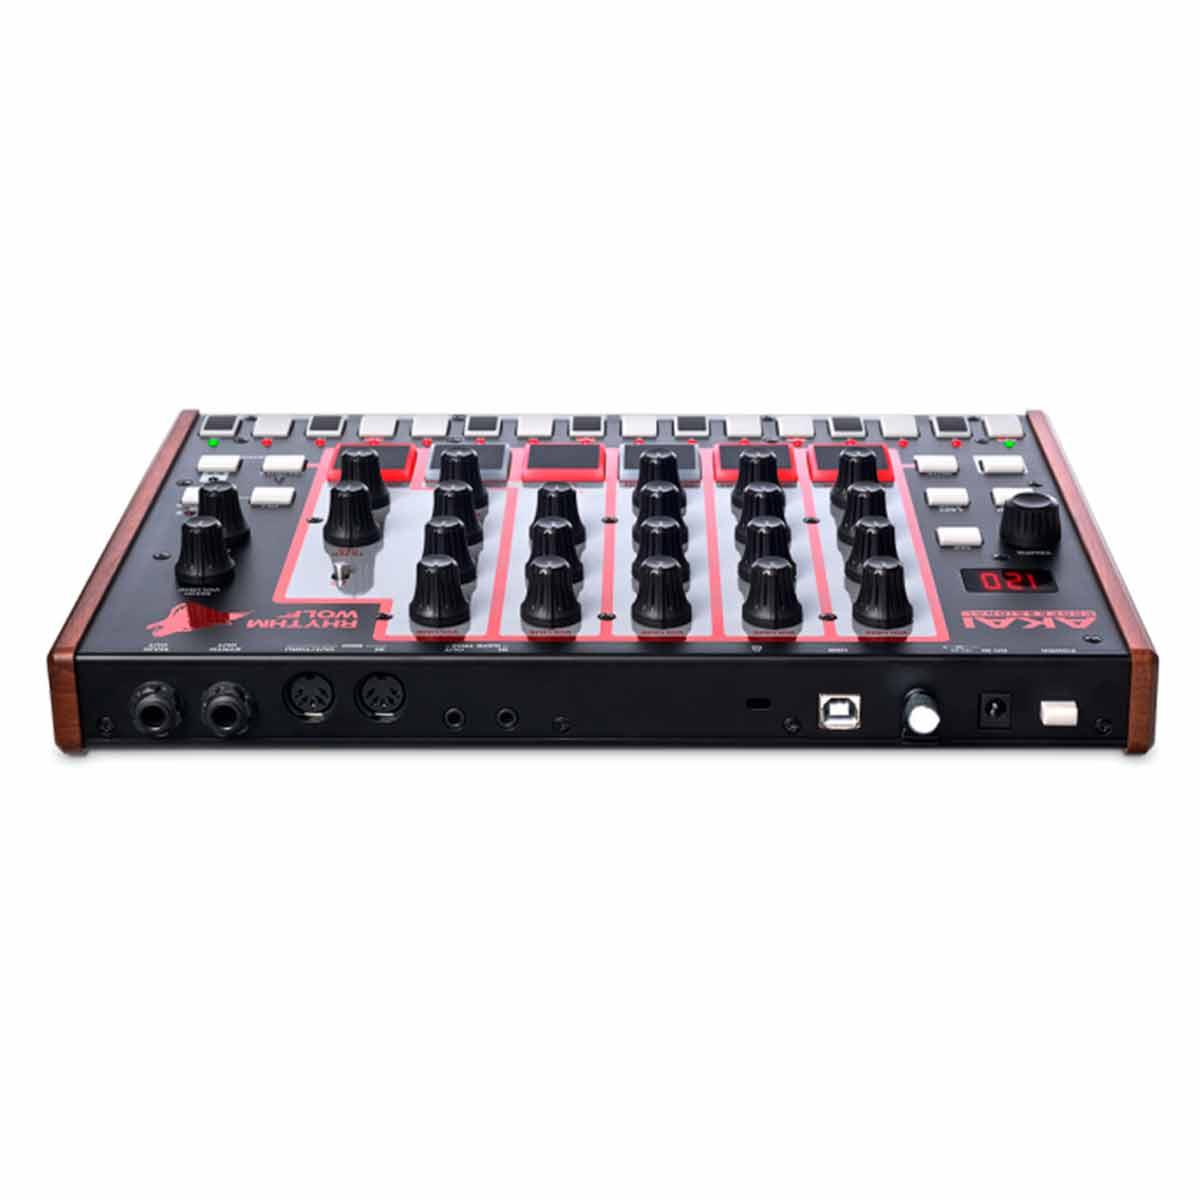 Rhythm Wolf - Bateria Eletrônica e Sintetizador de Baixo - AKAI